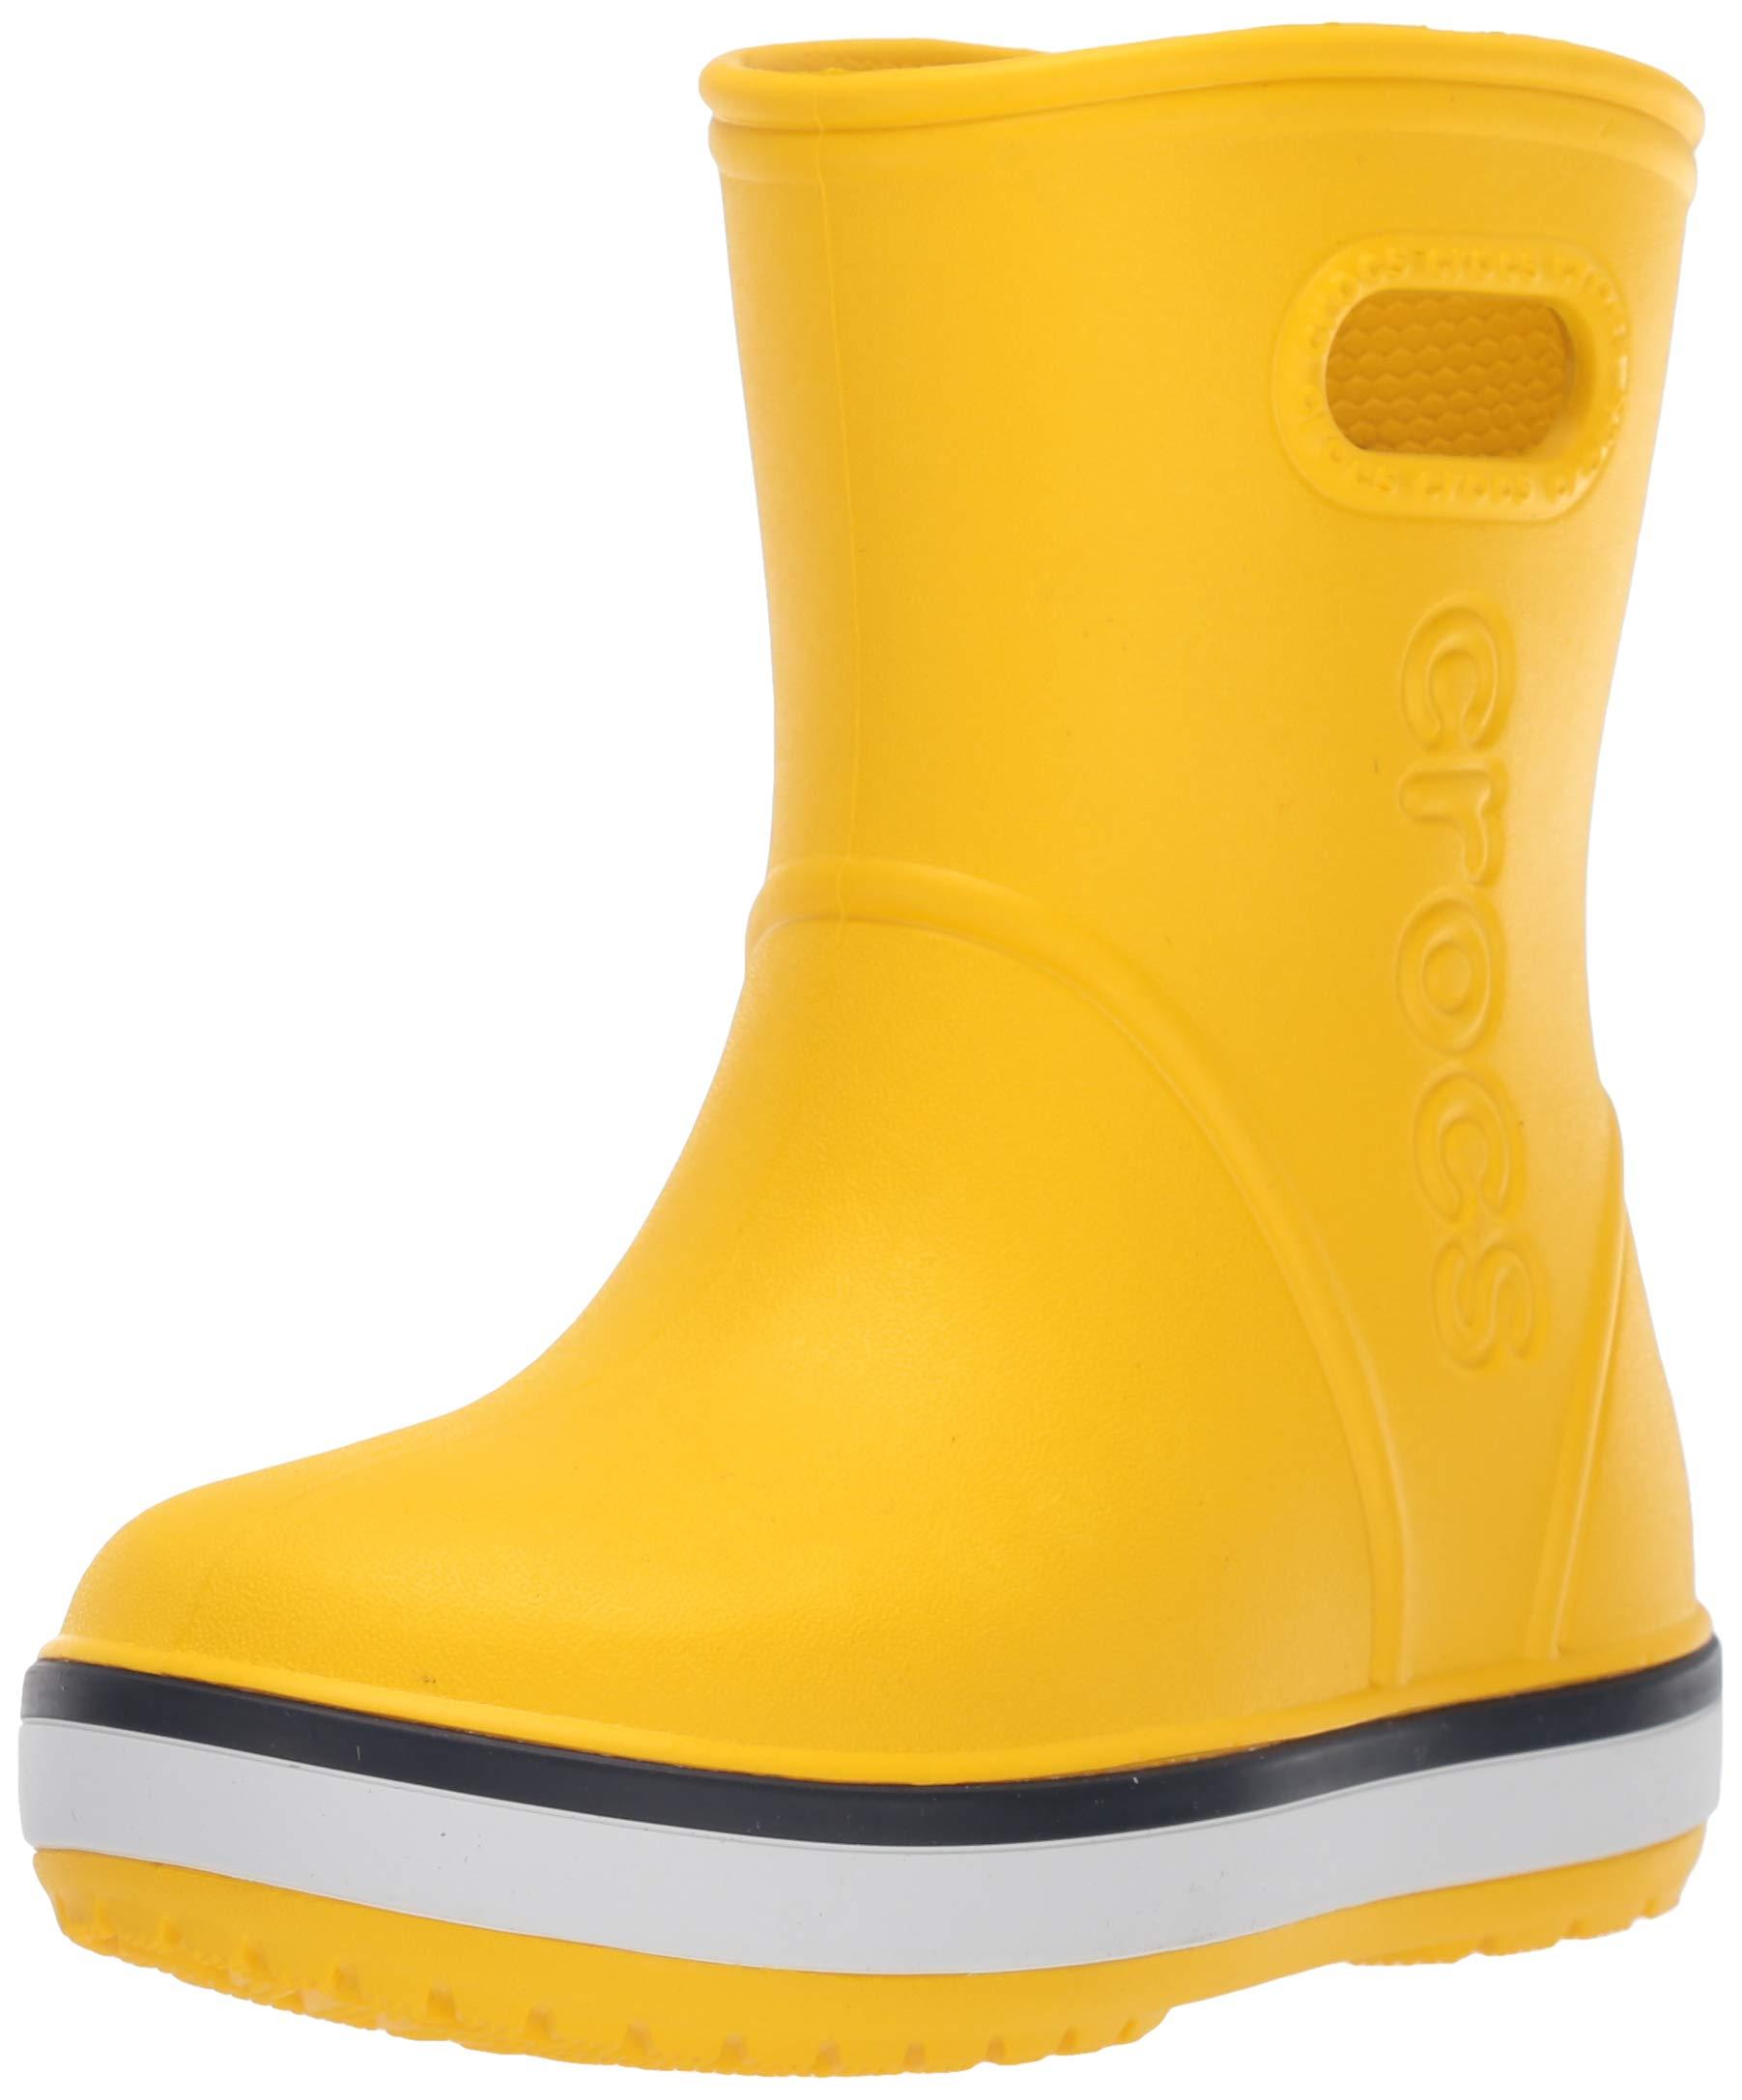 Crocs Baby Crocband Yellow Toddler